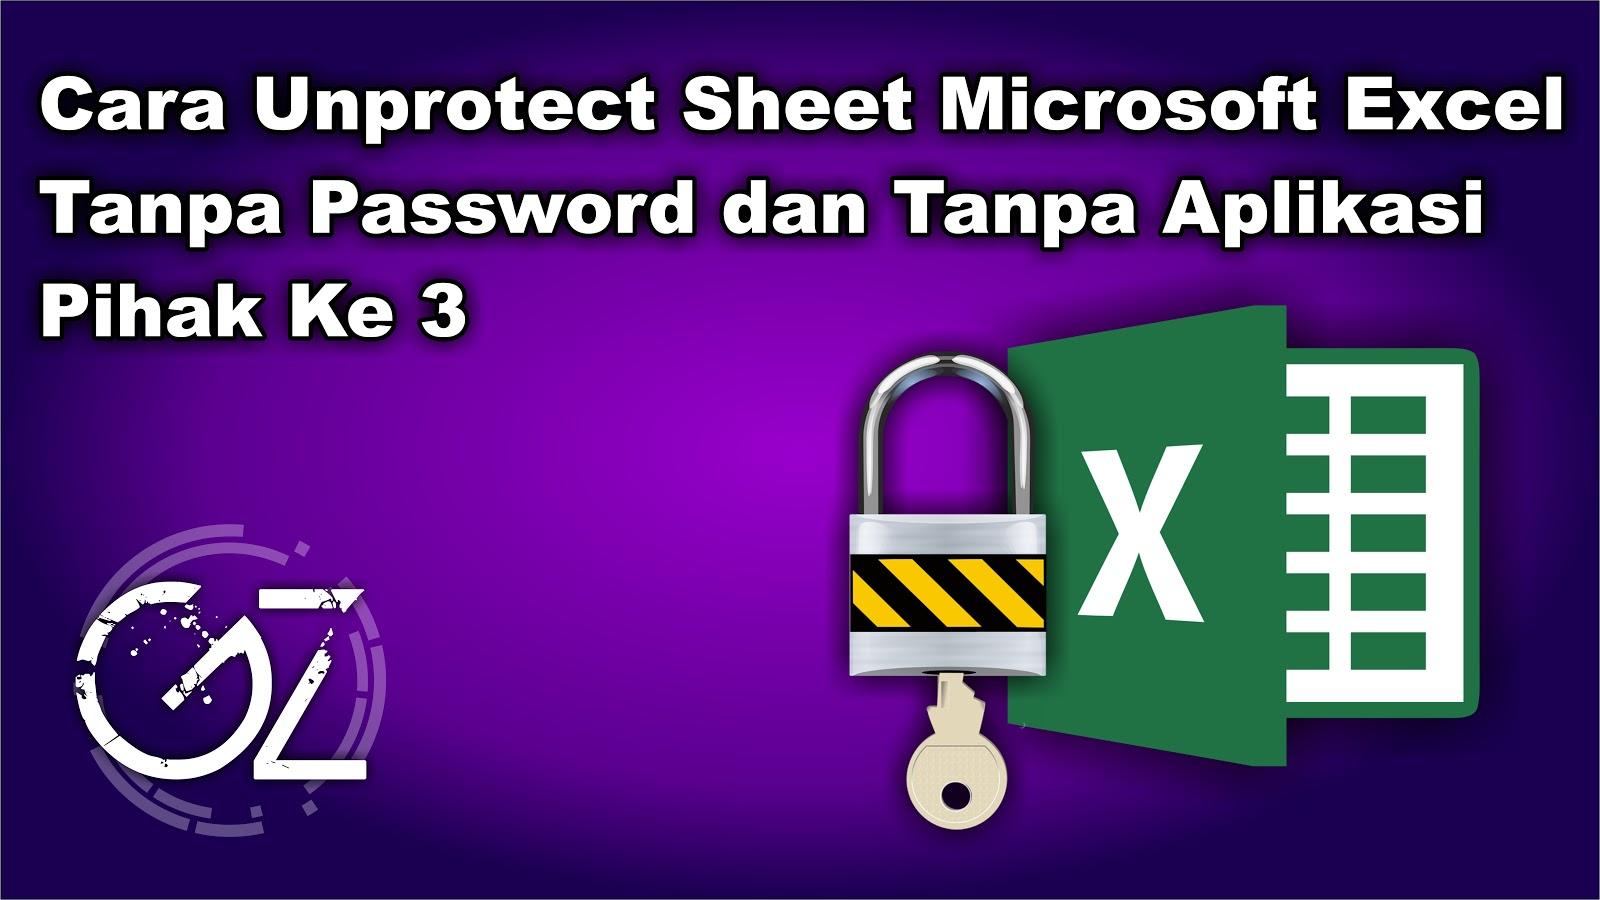 Cara Unprotect Sheet Microsoft Excel Tanpa Password Bag 1